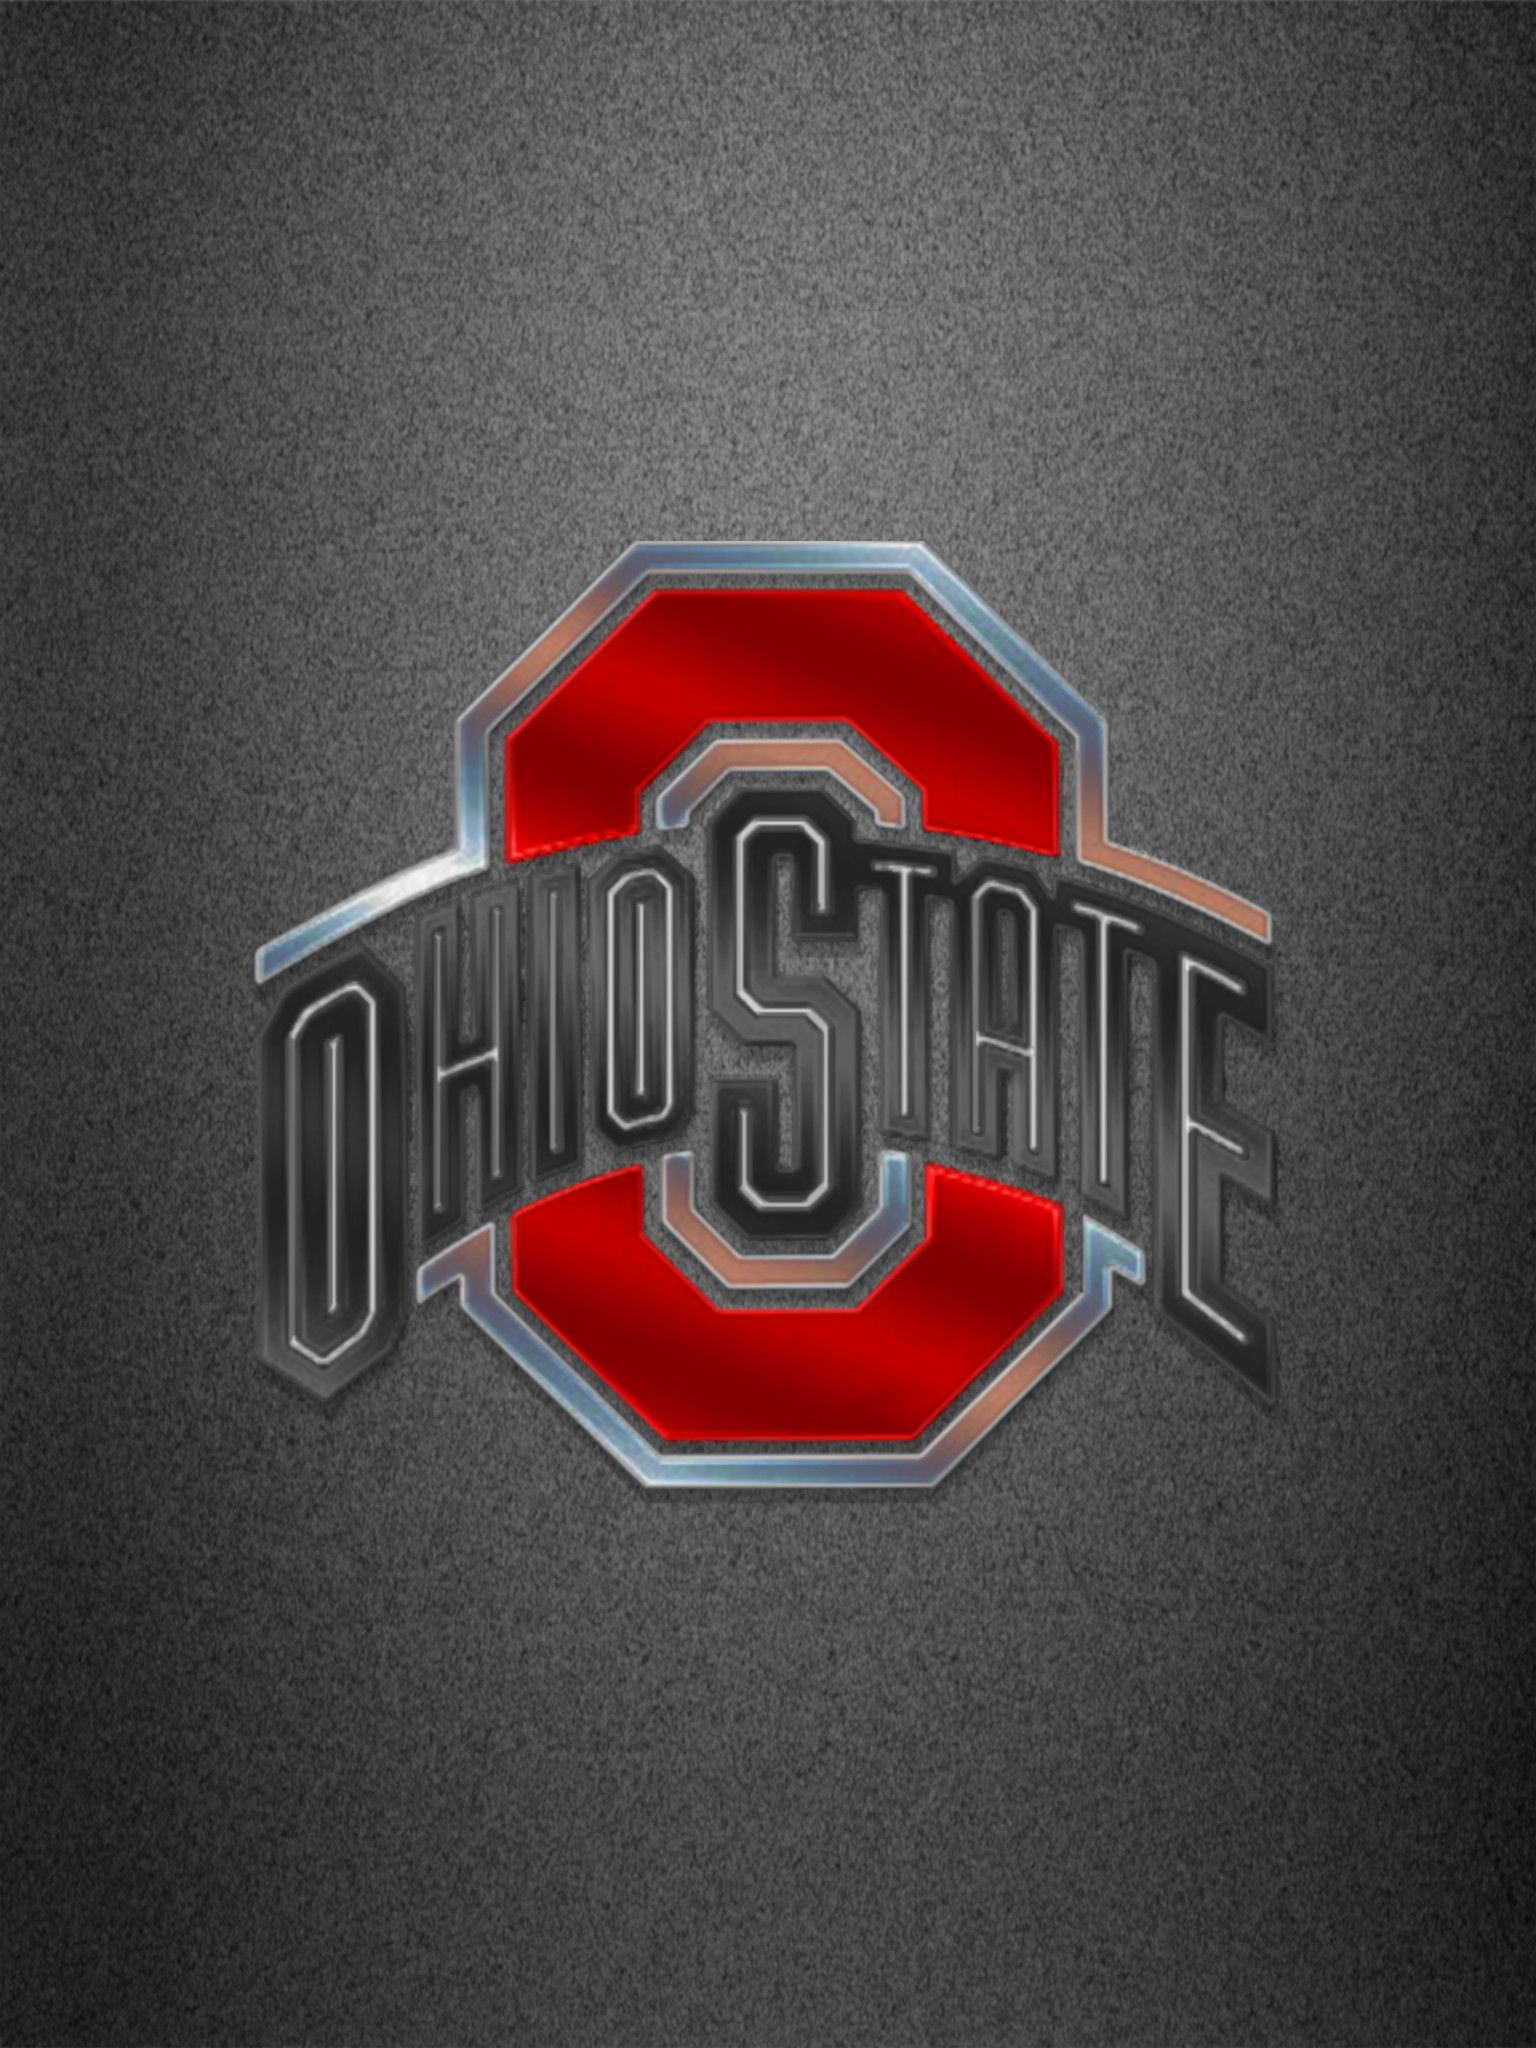 Osu 9 7 Inch Ipad Wallpaper 600 Ohio State Buckeyes Football Logo Buckeye Nation Ohio State Buckeyes Football